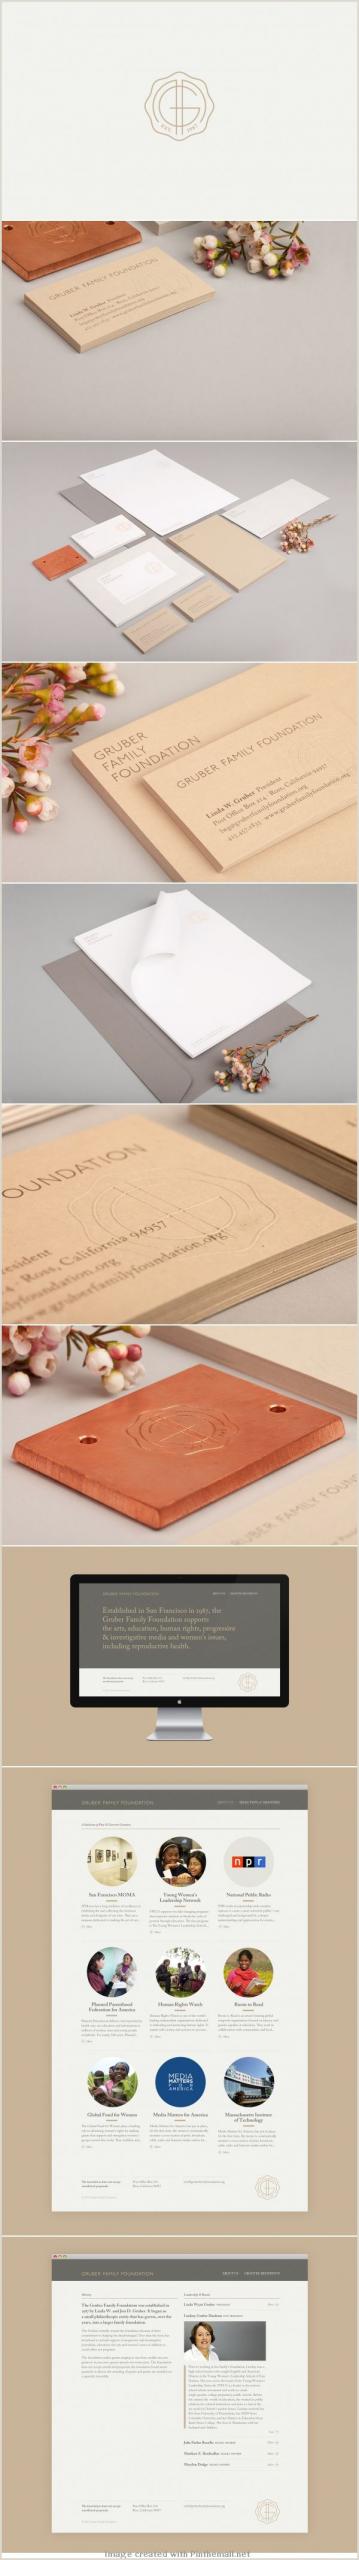 Title On Business Card 14 Popular Hardwood Flooring Business Card Template